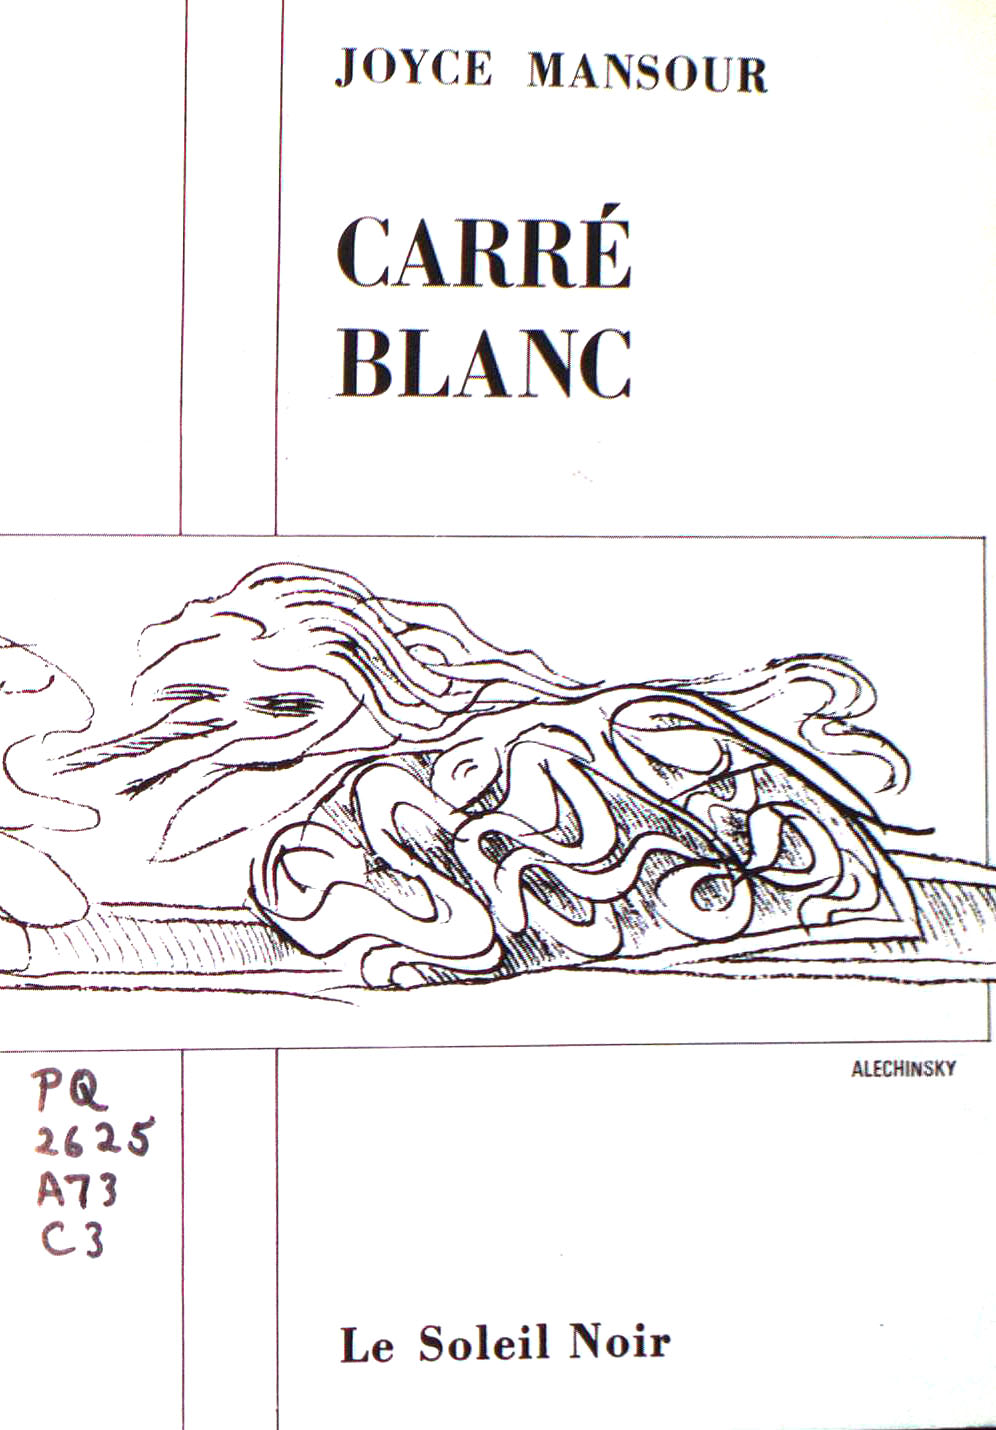 Joyce Mansour, <br /><em>Carréblanc</em>, 1965